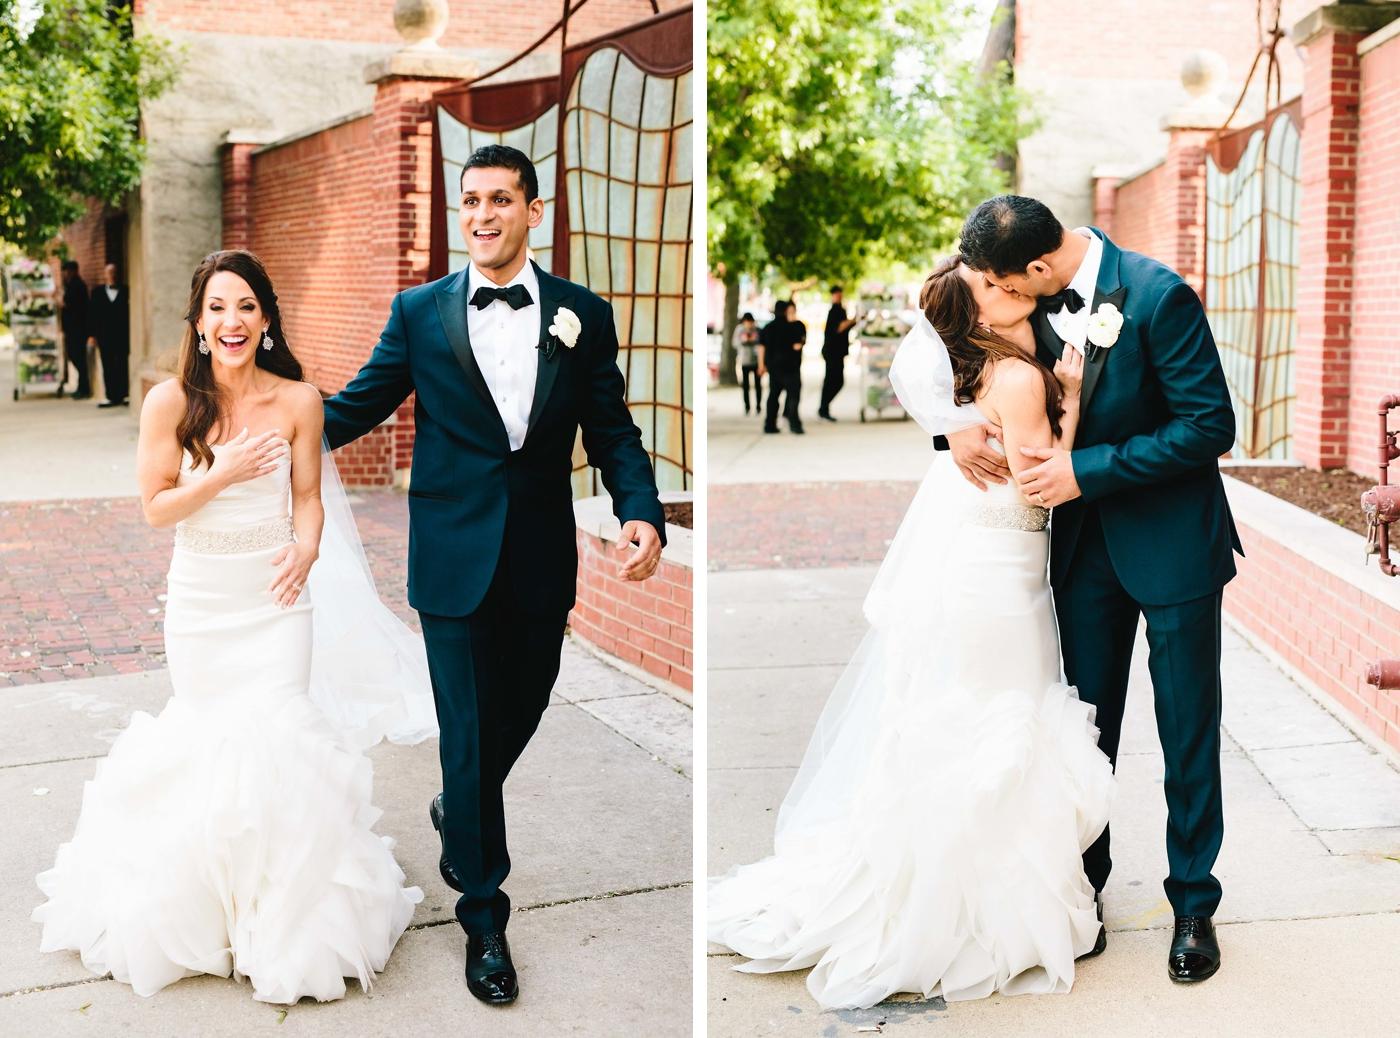 chicago-fine-art-wedding-photography-sakamuri62